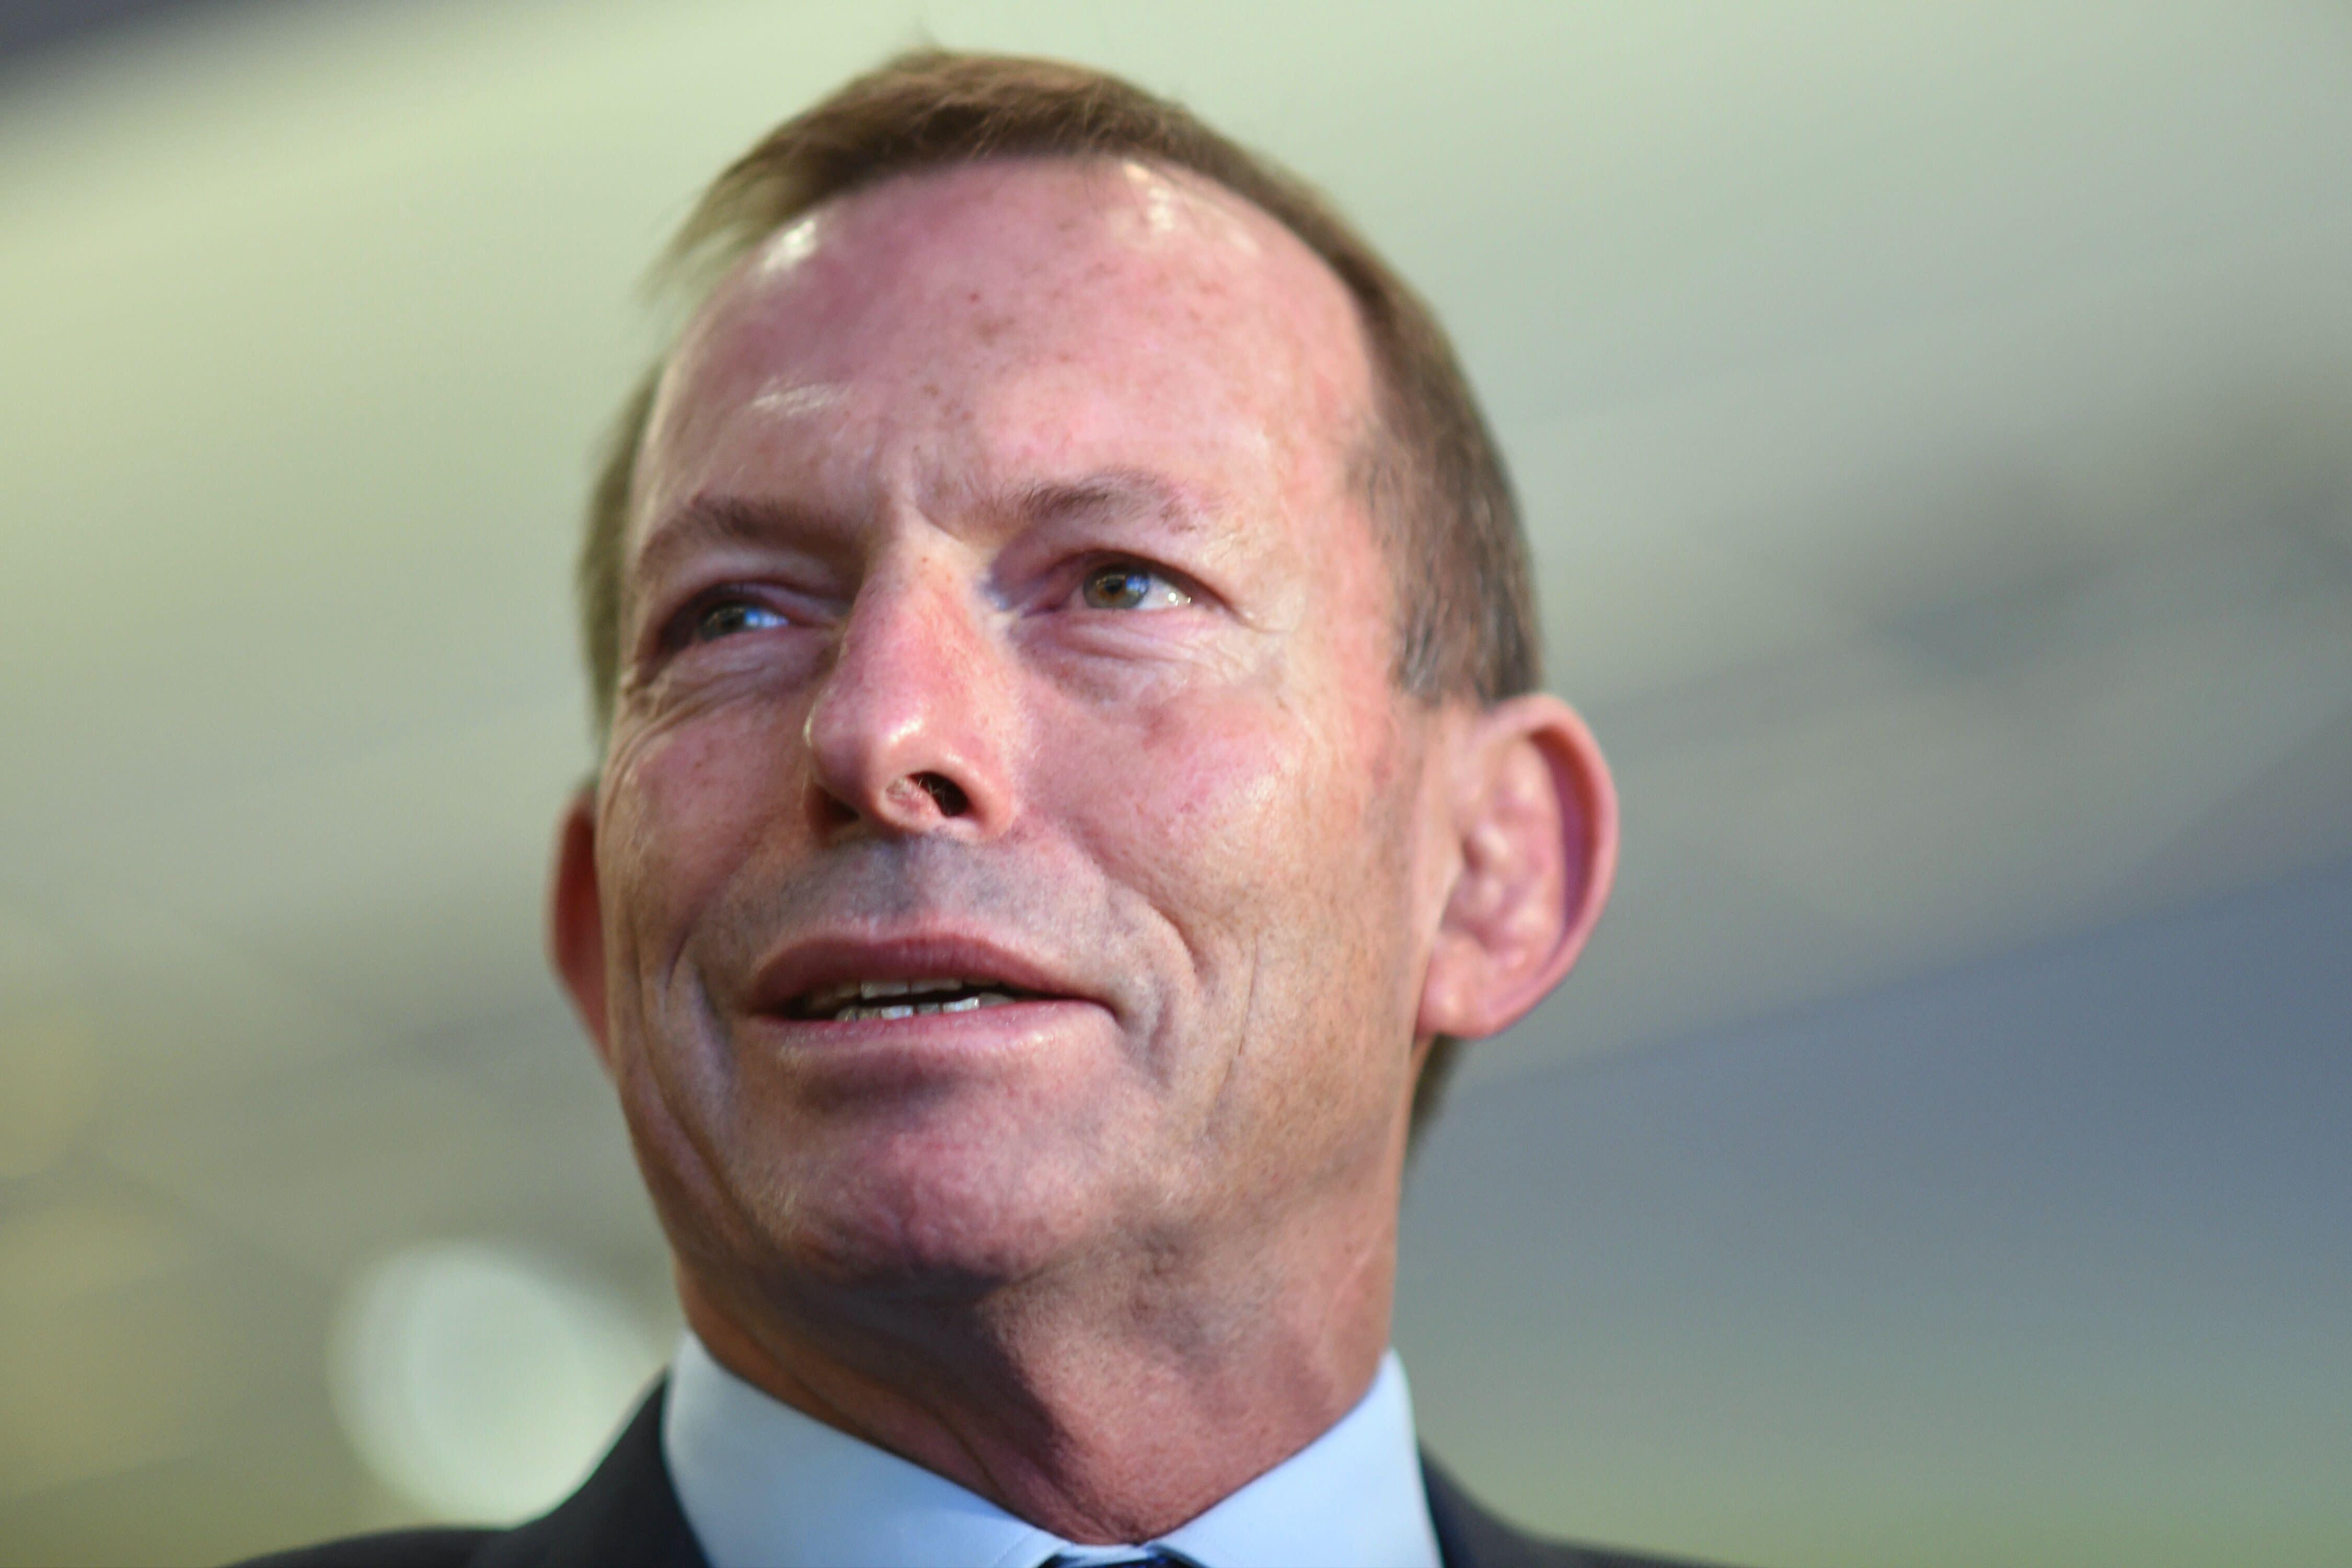 Tony Abbott scores $300,000 pension